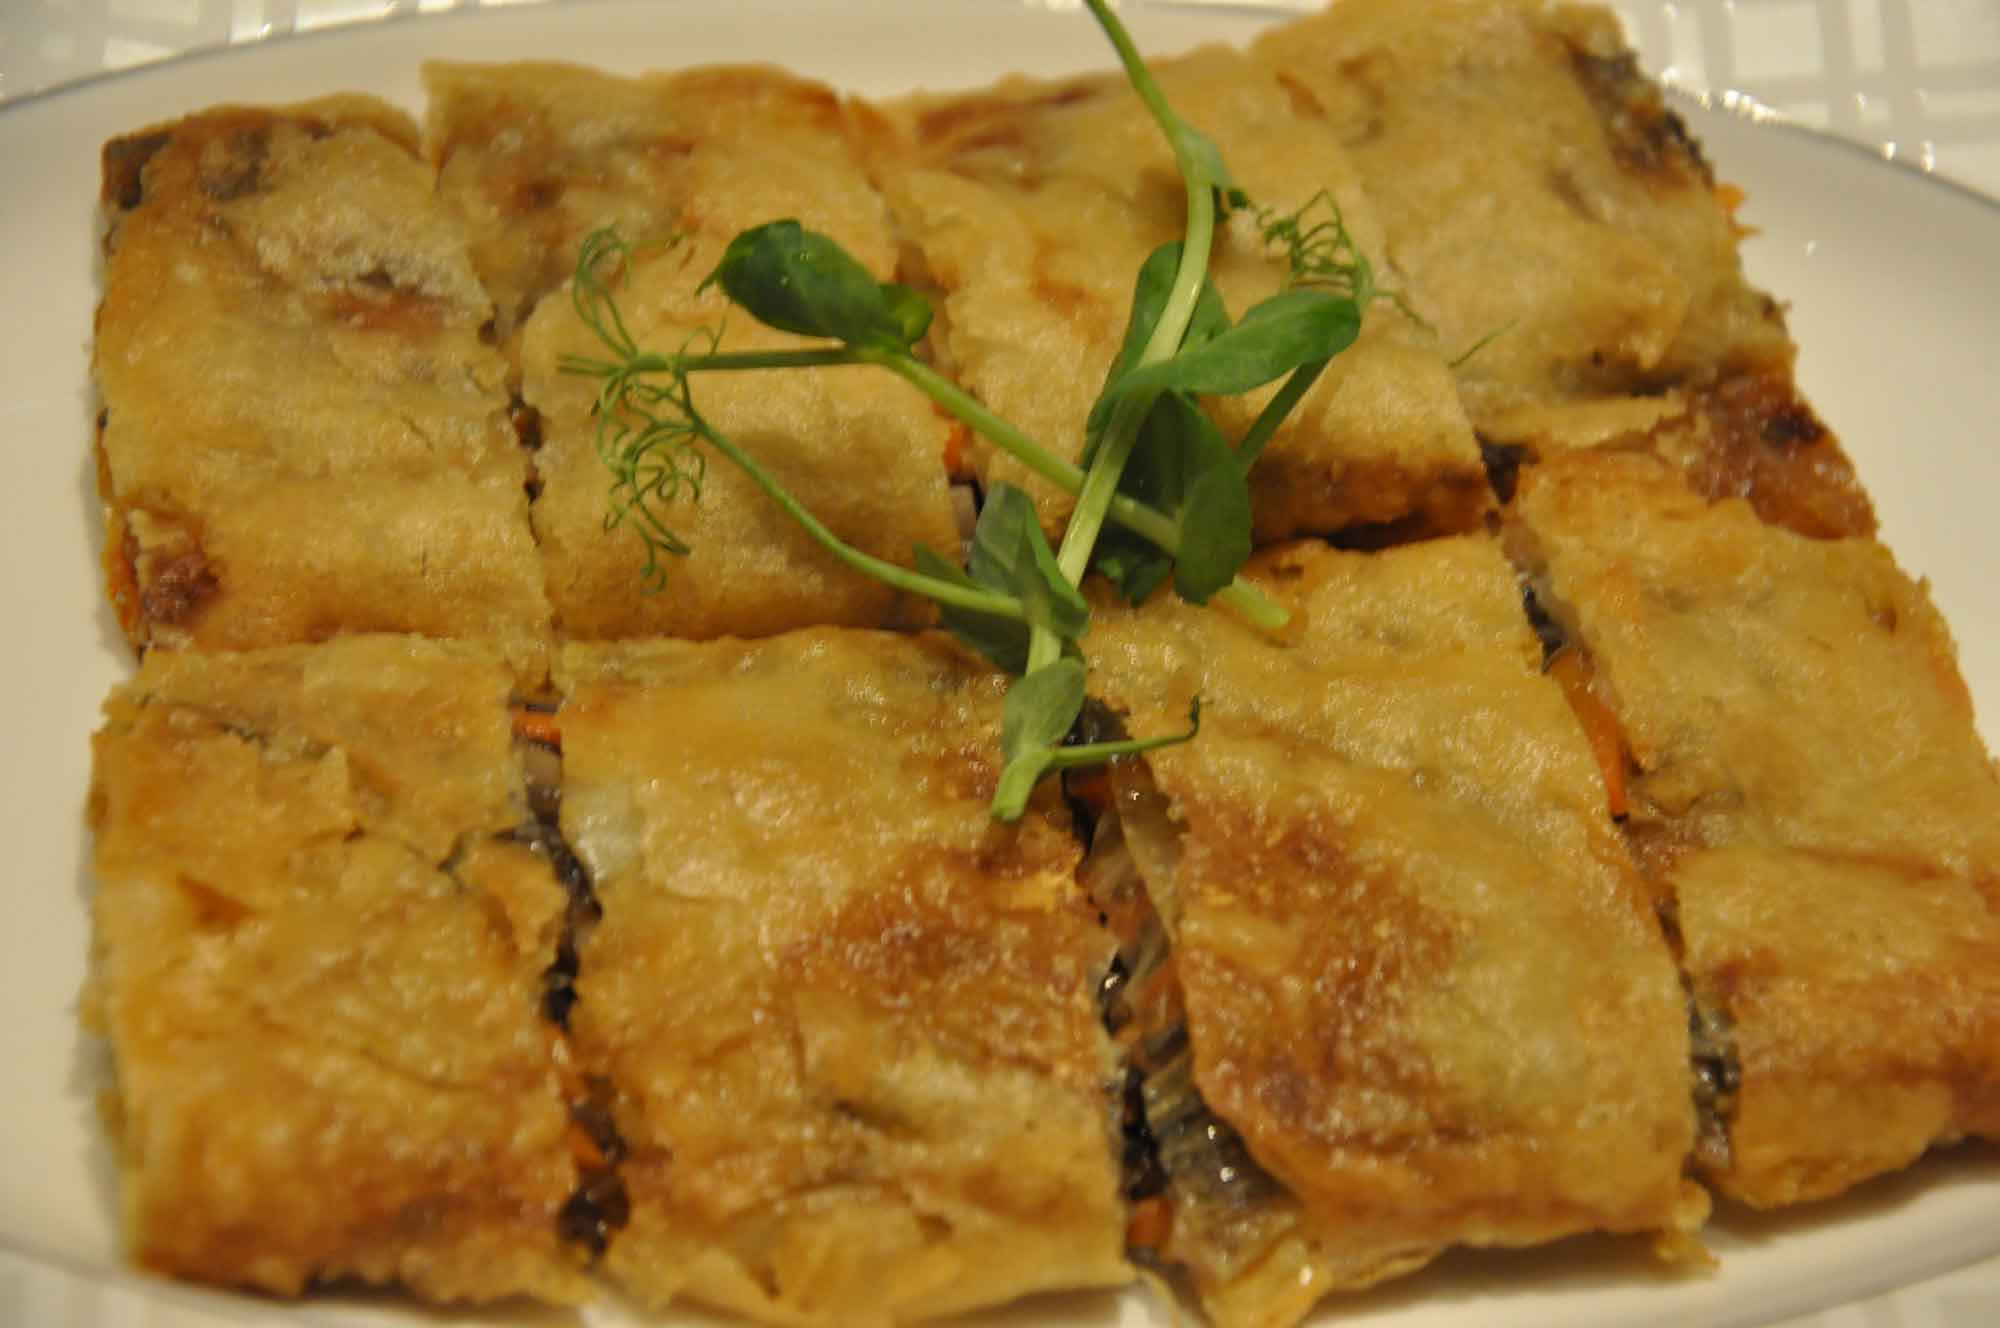 Lai Heen Macau Smoked Binkert with Carrots and Mushrooms